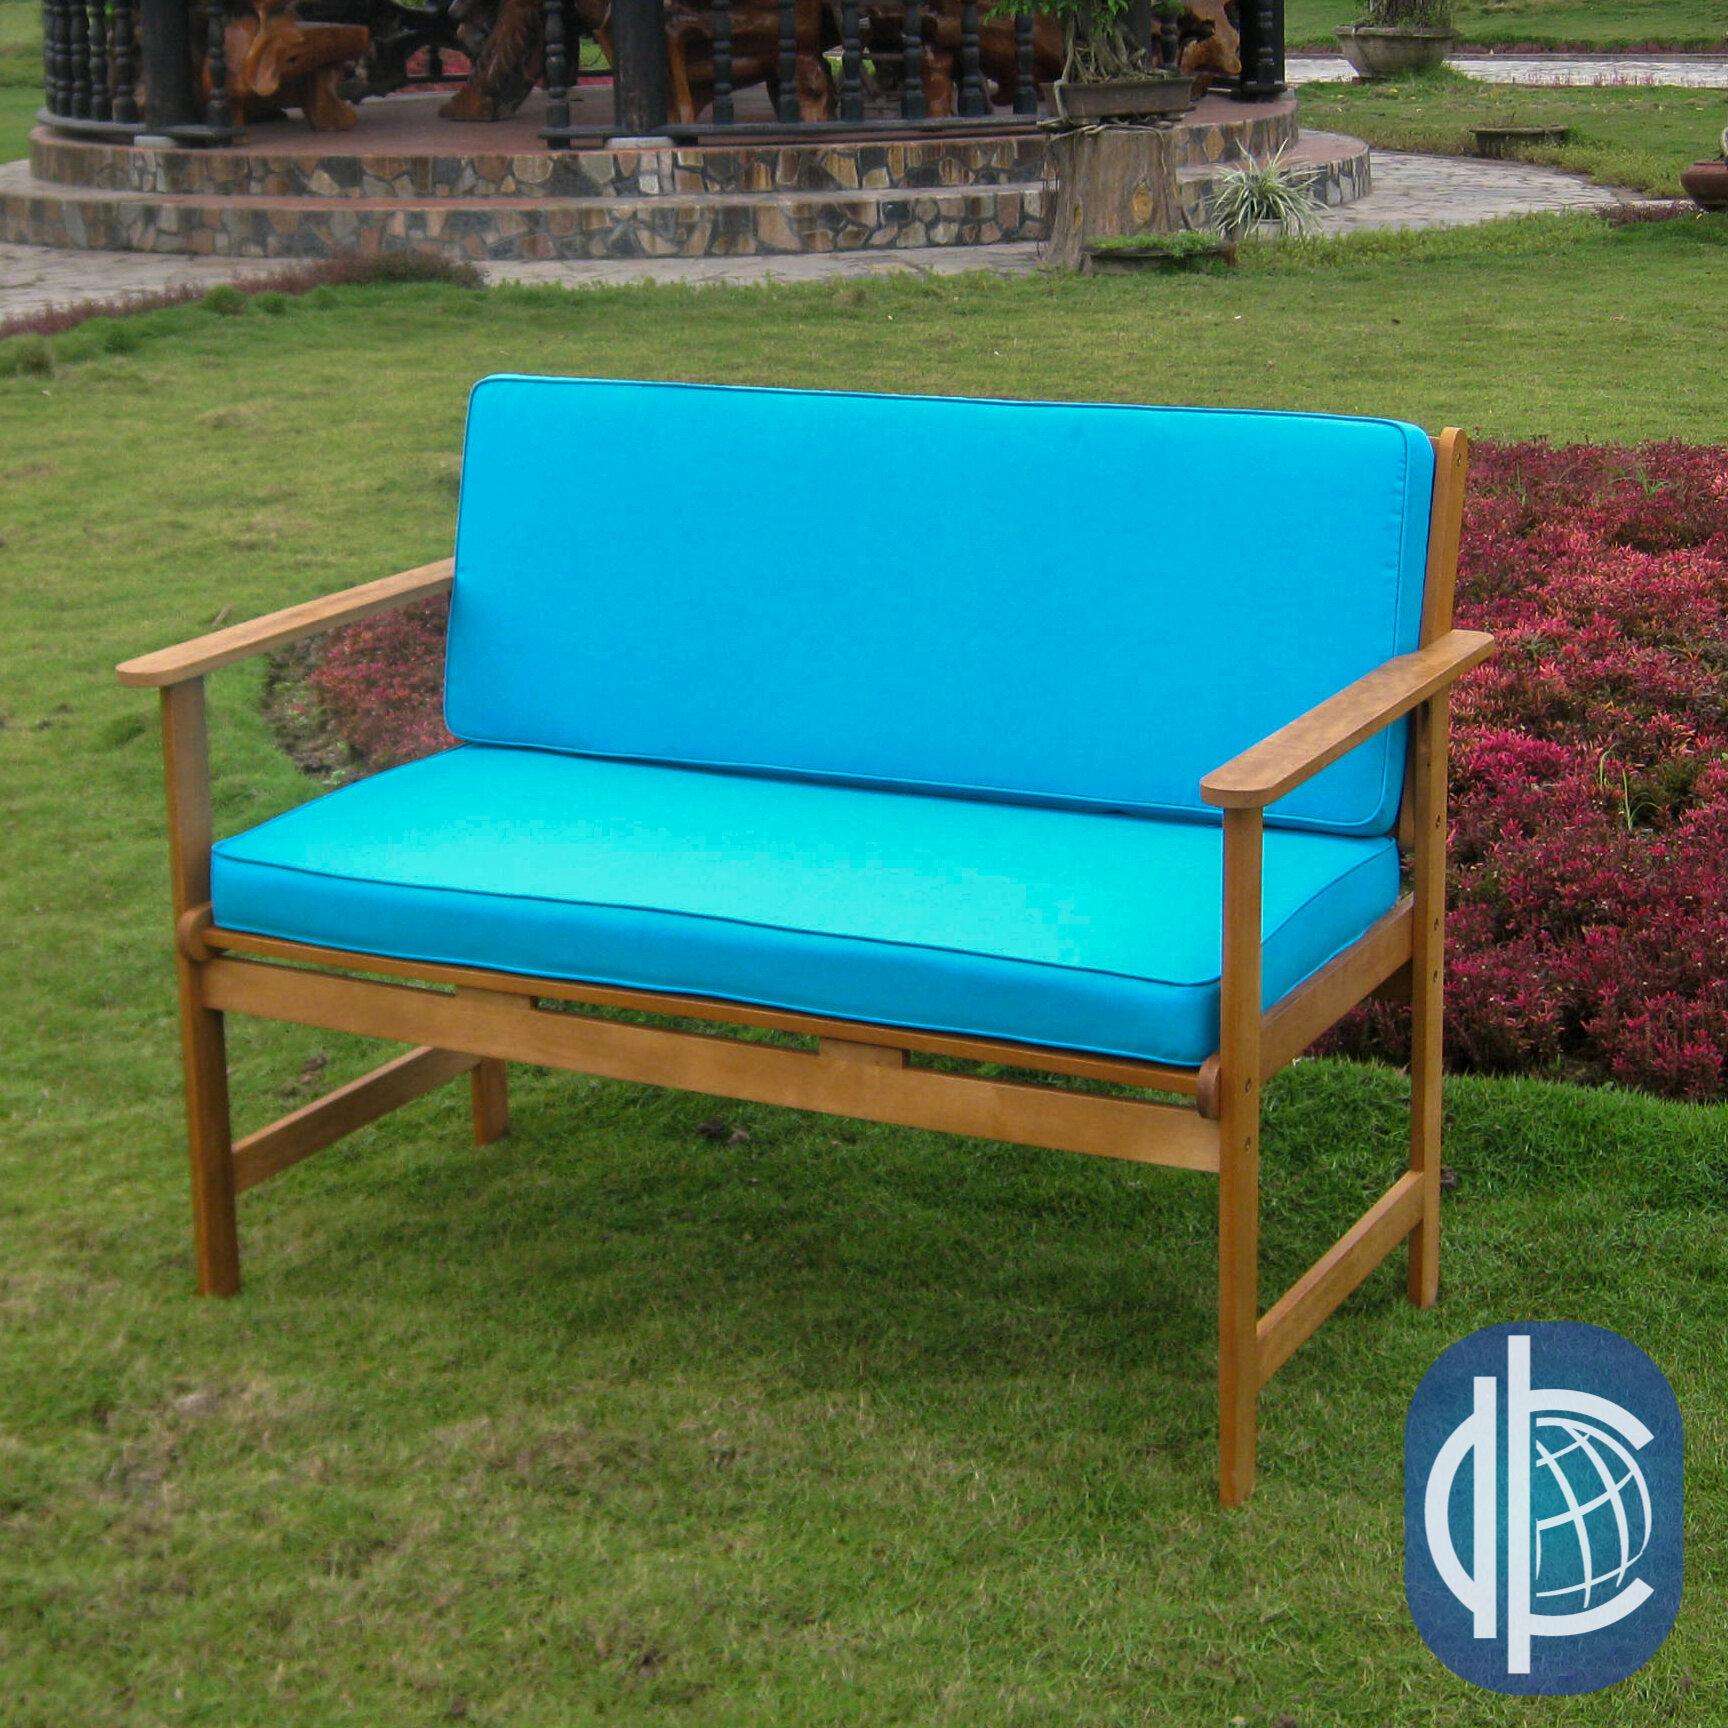 Breakwater Bay Sabbattus Wood Garden Bench With Cushions Reviews Wayfair